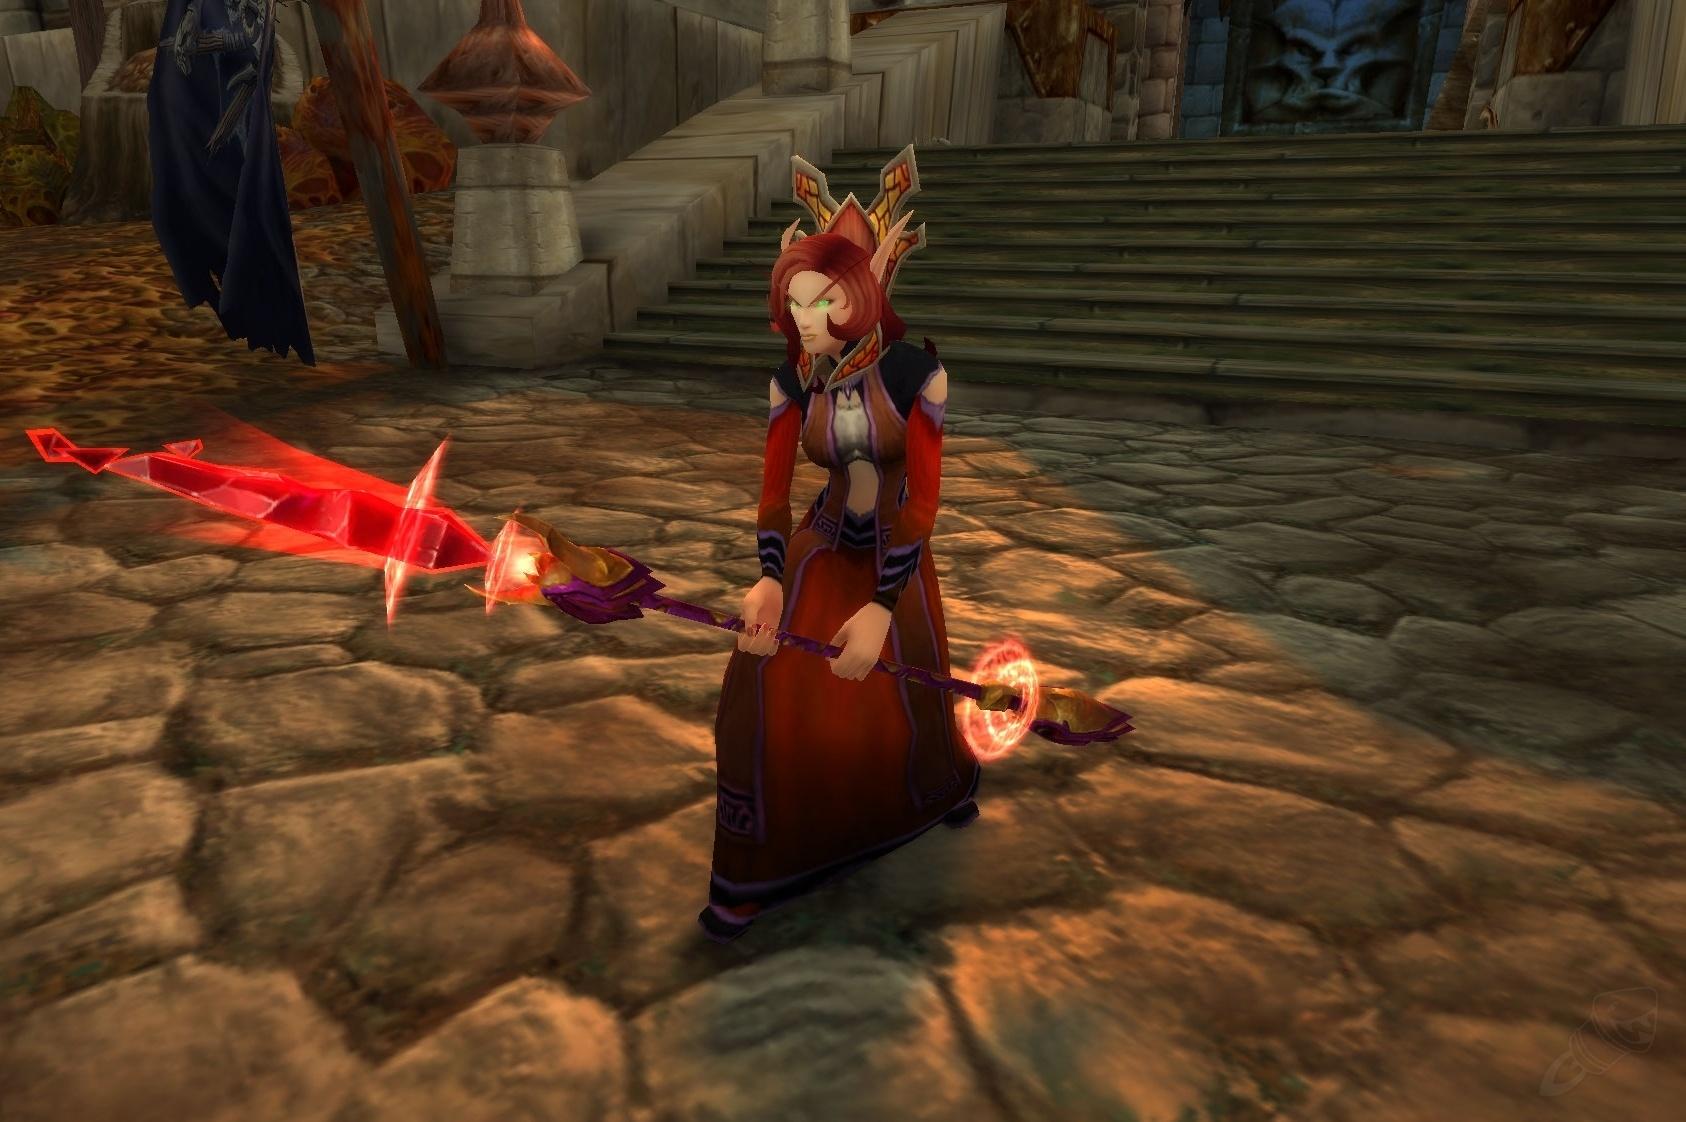 Braelyn Brasemain - PNJ - World of Warcraft